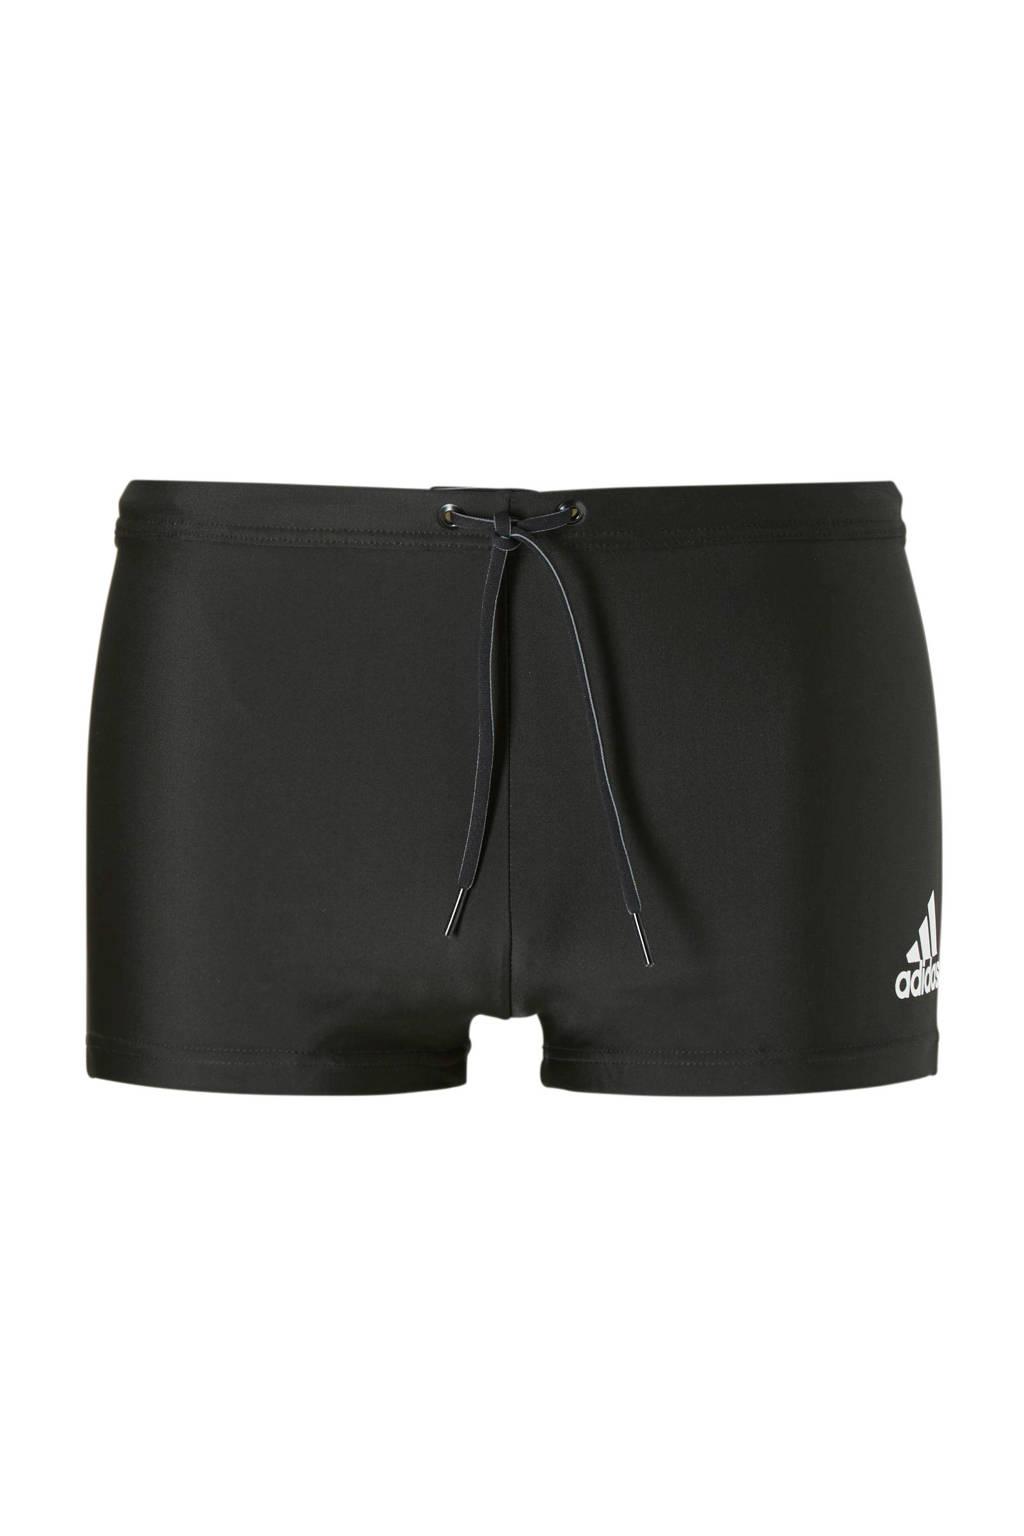 adidas performance zwemboxer met logo zwart, Zwart